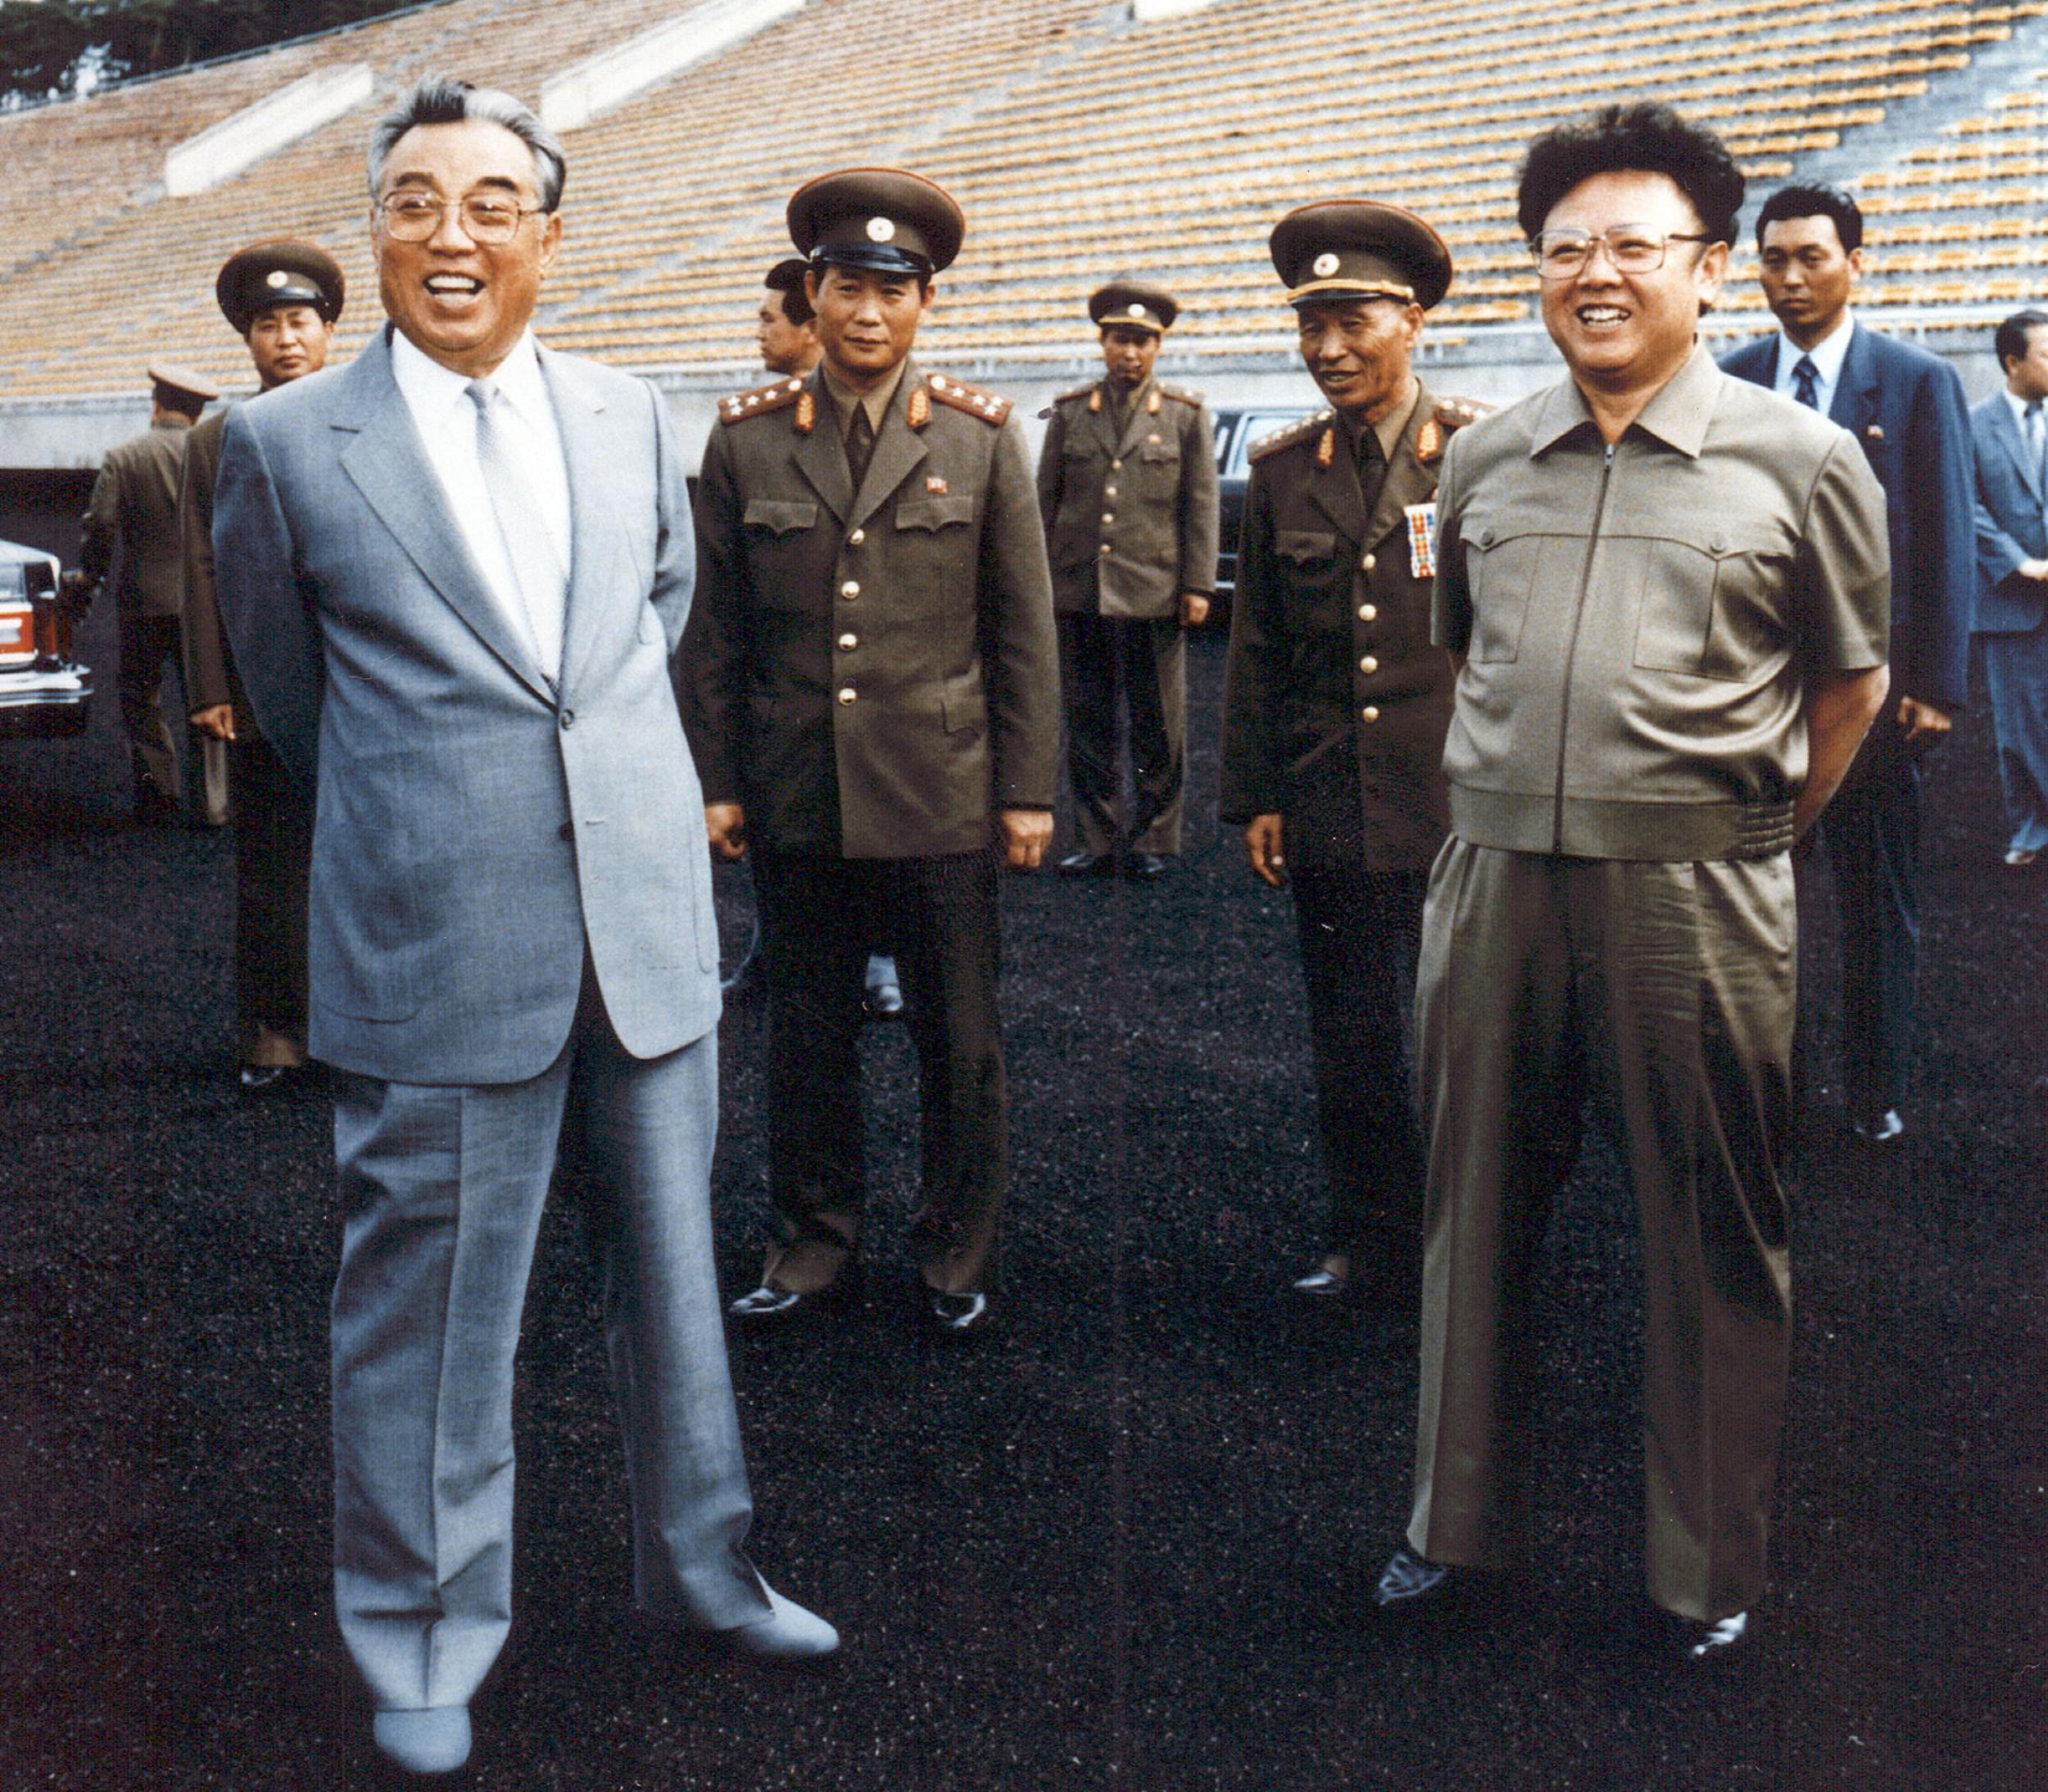 Kim Jong Un's tangled family history